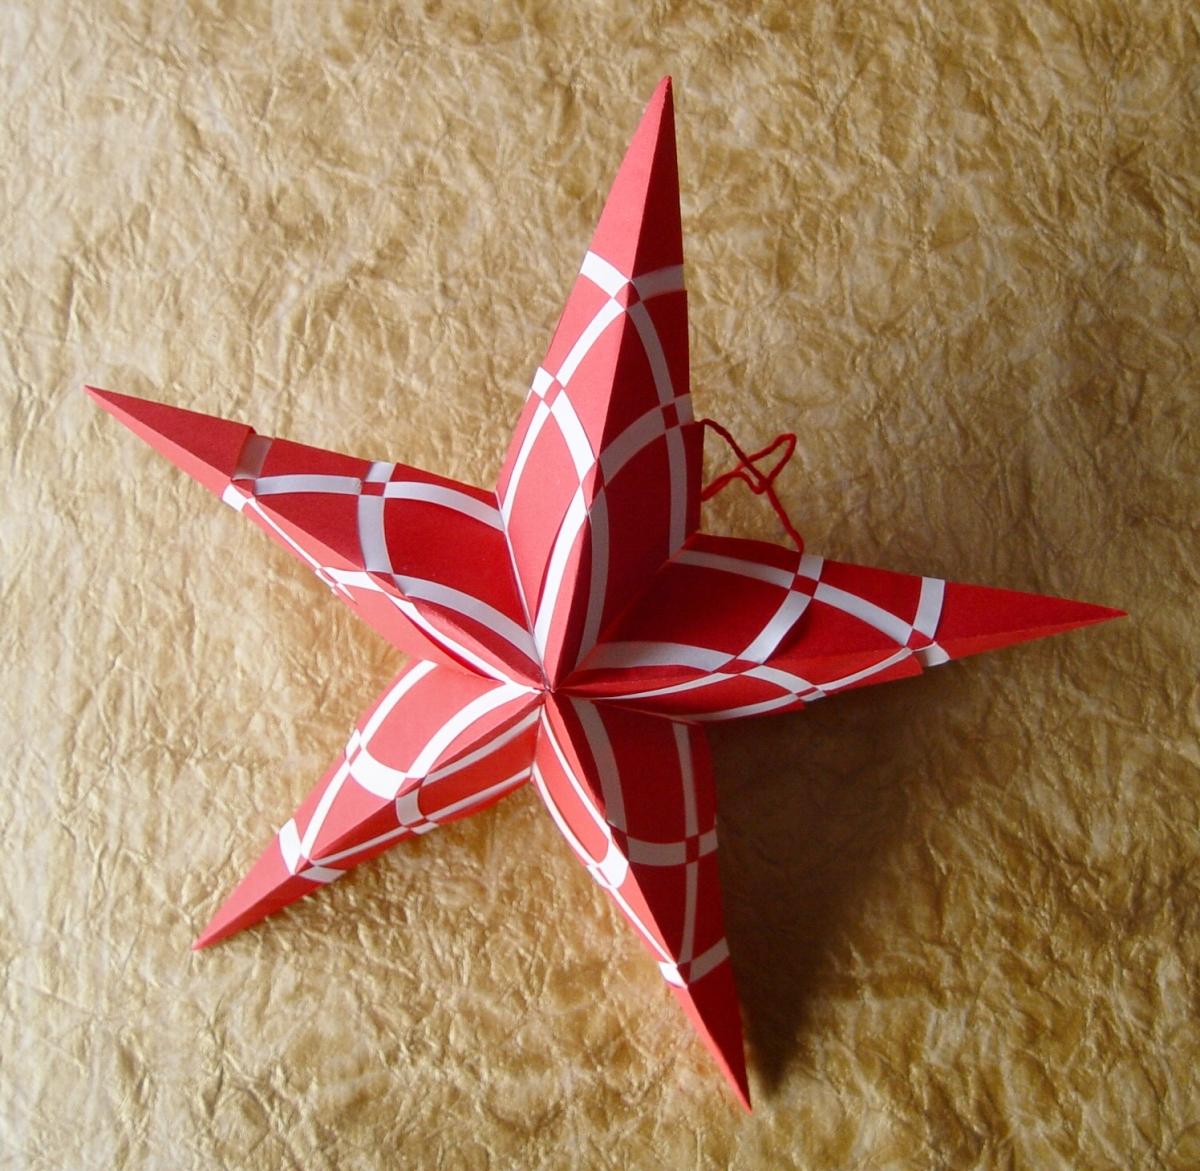 Homemade Christmas Star Ornament: Star #005 Woven